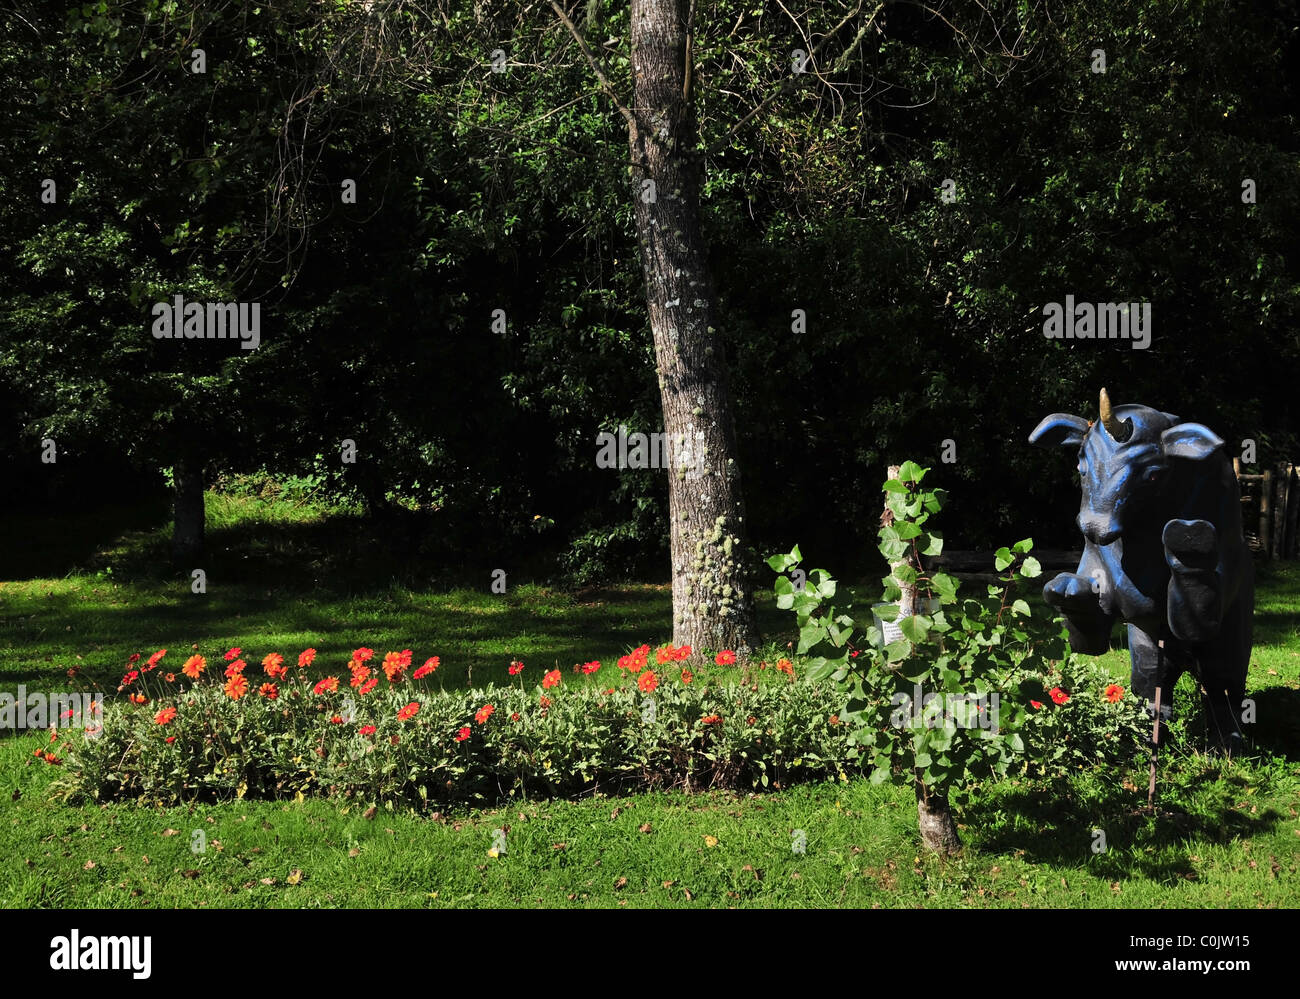 Sunny garden view, with red flowers, grass, trees and blue Camahueto bull-unicorn effigy , Caulin, Chiloe Island, Stock Photo